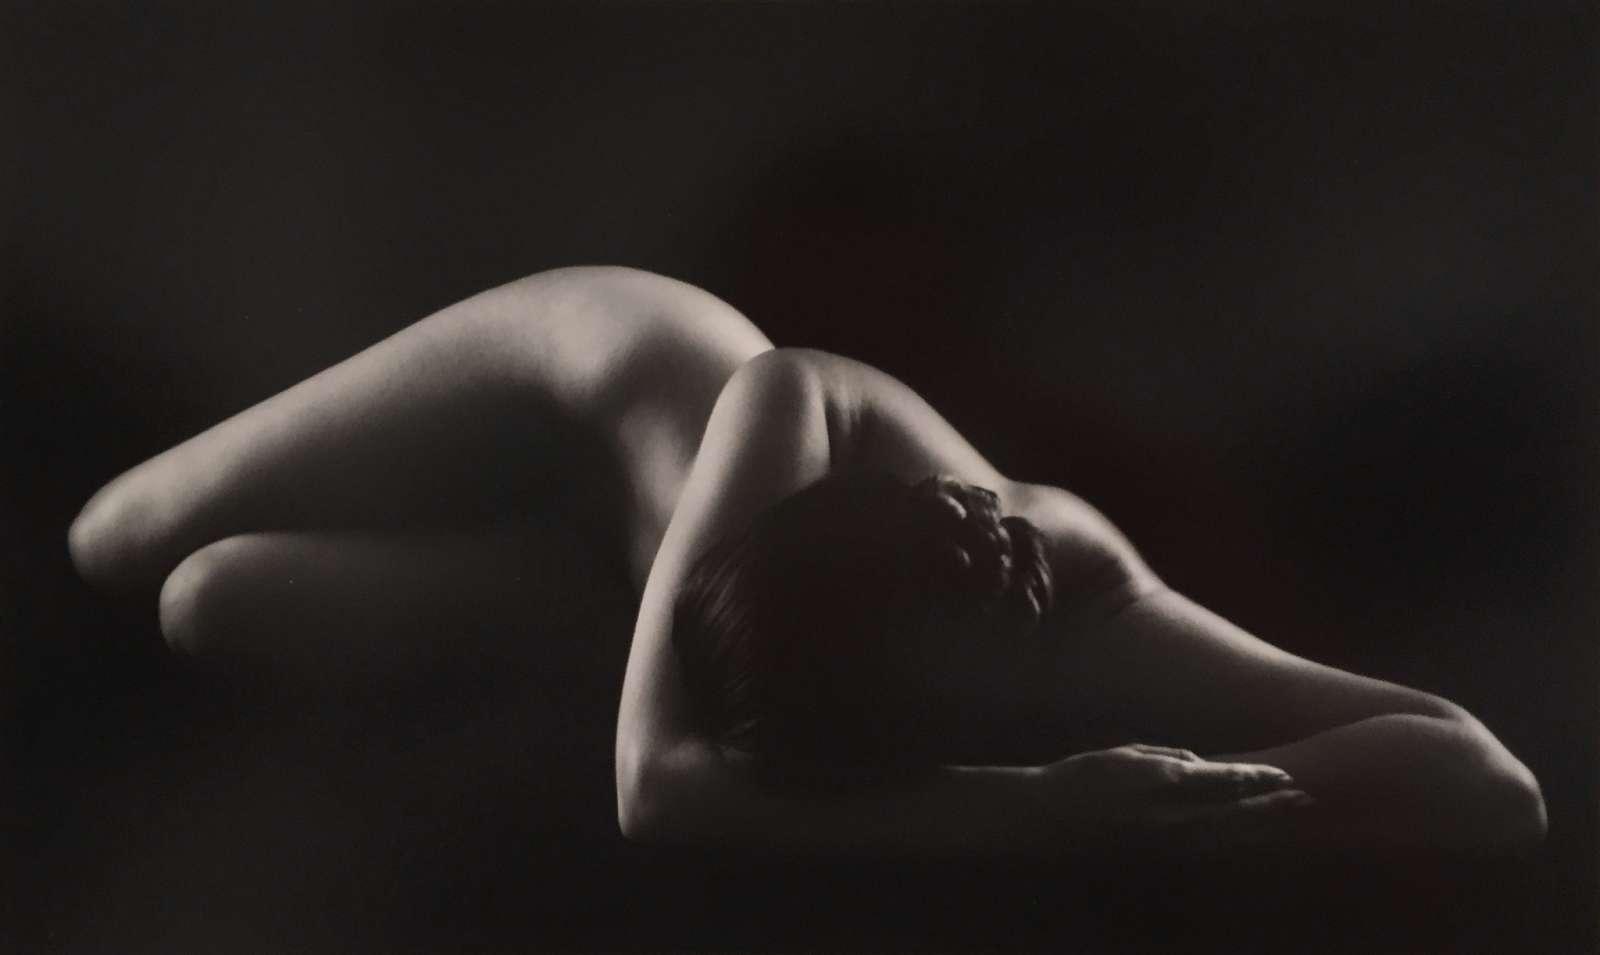 Ruth Bernhard, Perspective II, 1967